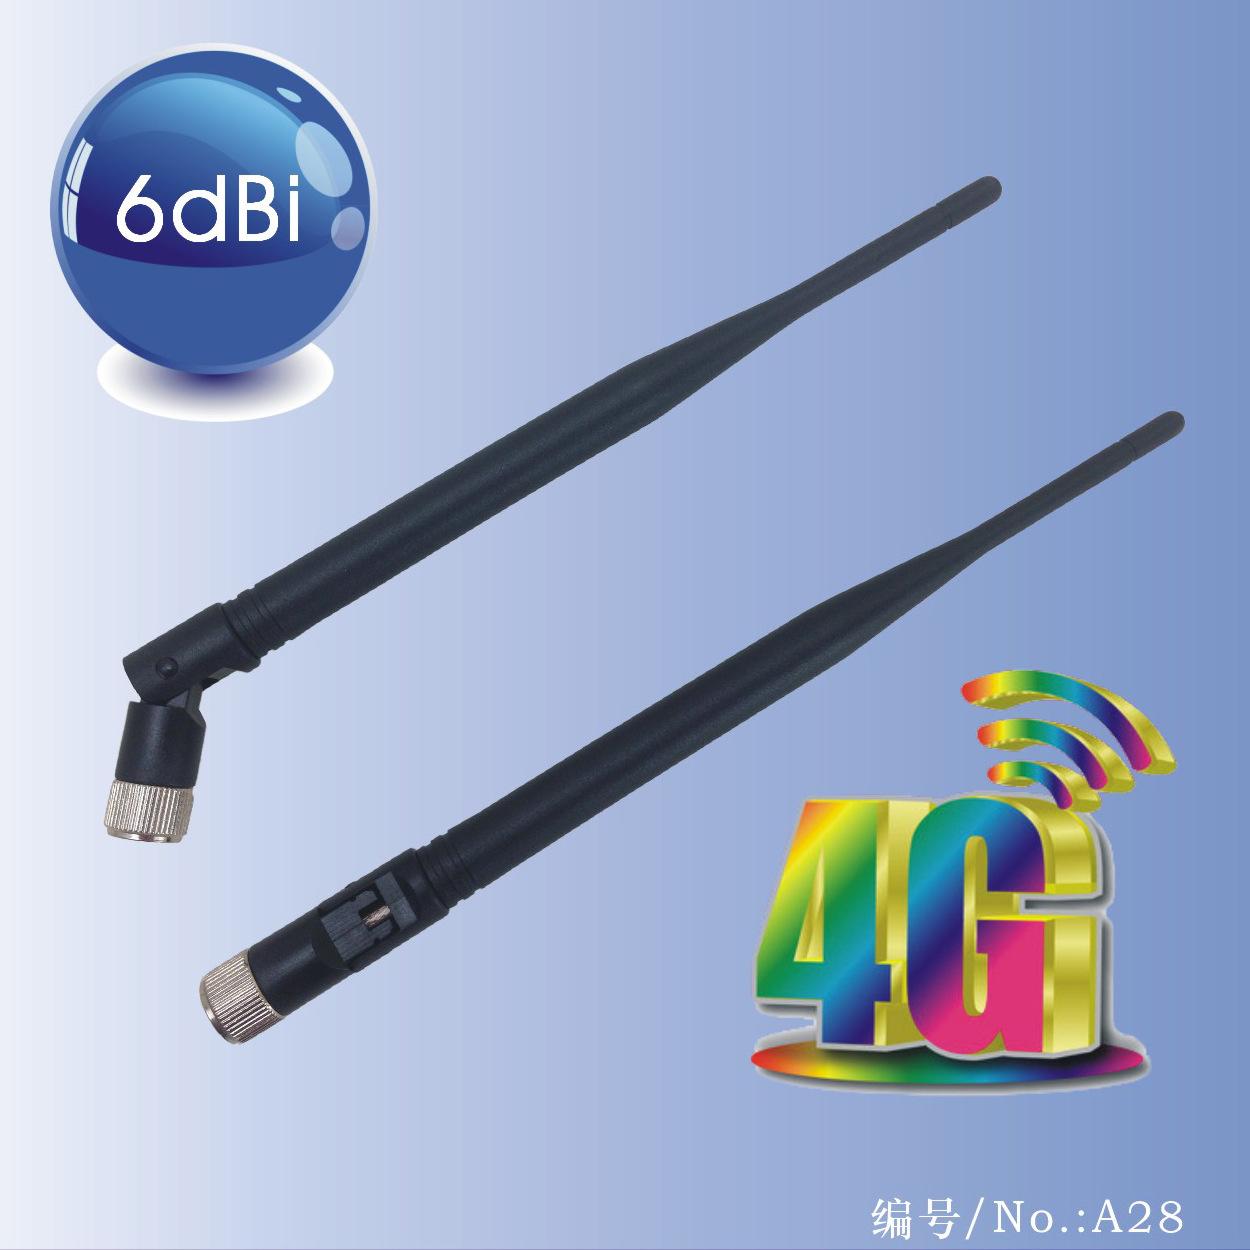 4g lte专用天线 华为网卡FDD-LTE中兴终端天线TD移动4G外置天线